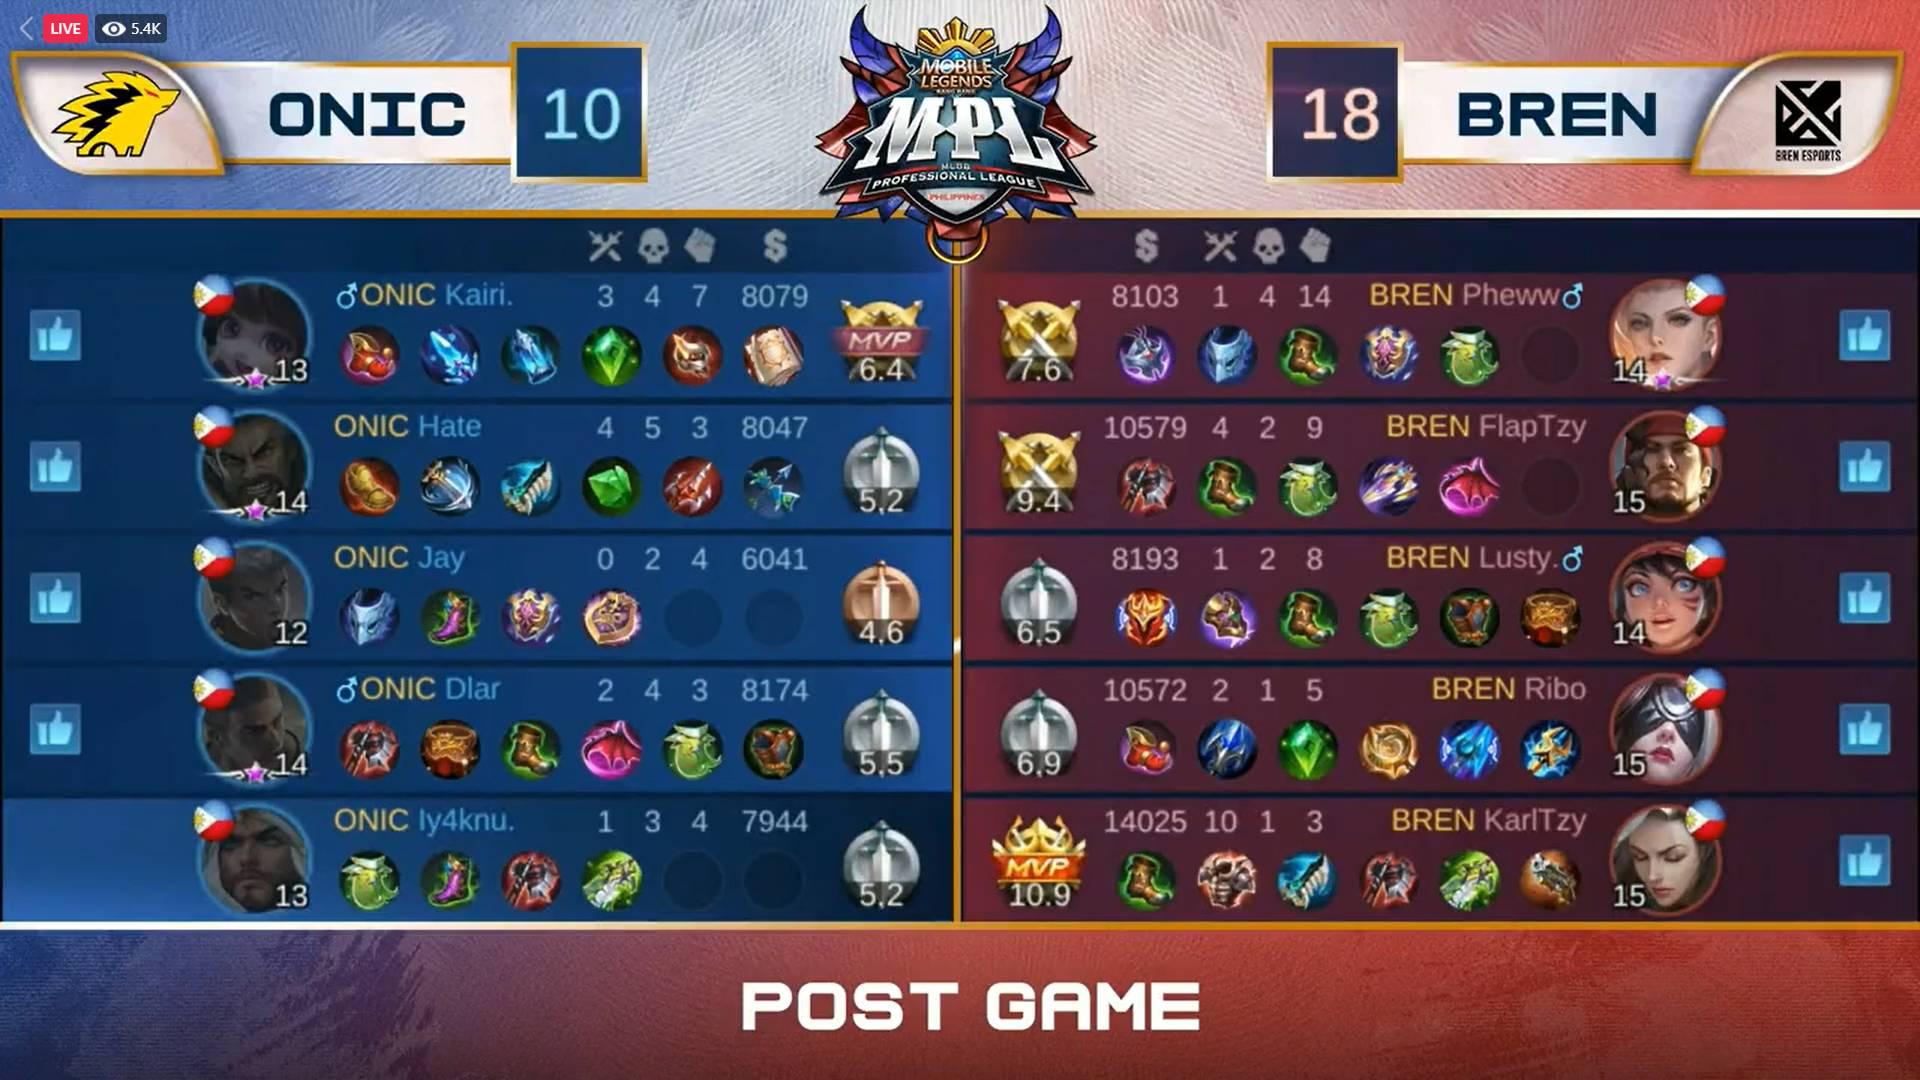 MPL-PH-7-Onic-def-Bren-Game-1 Kairi makes god bleed as ONIC upsets world champ BREN in MPL-PH ESports Mobile Legends MPL-PH News  - philippine sports news